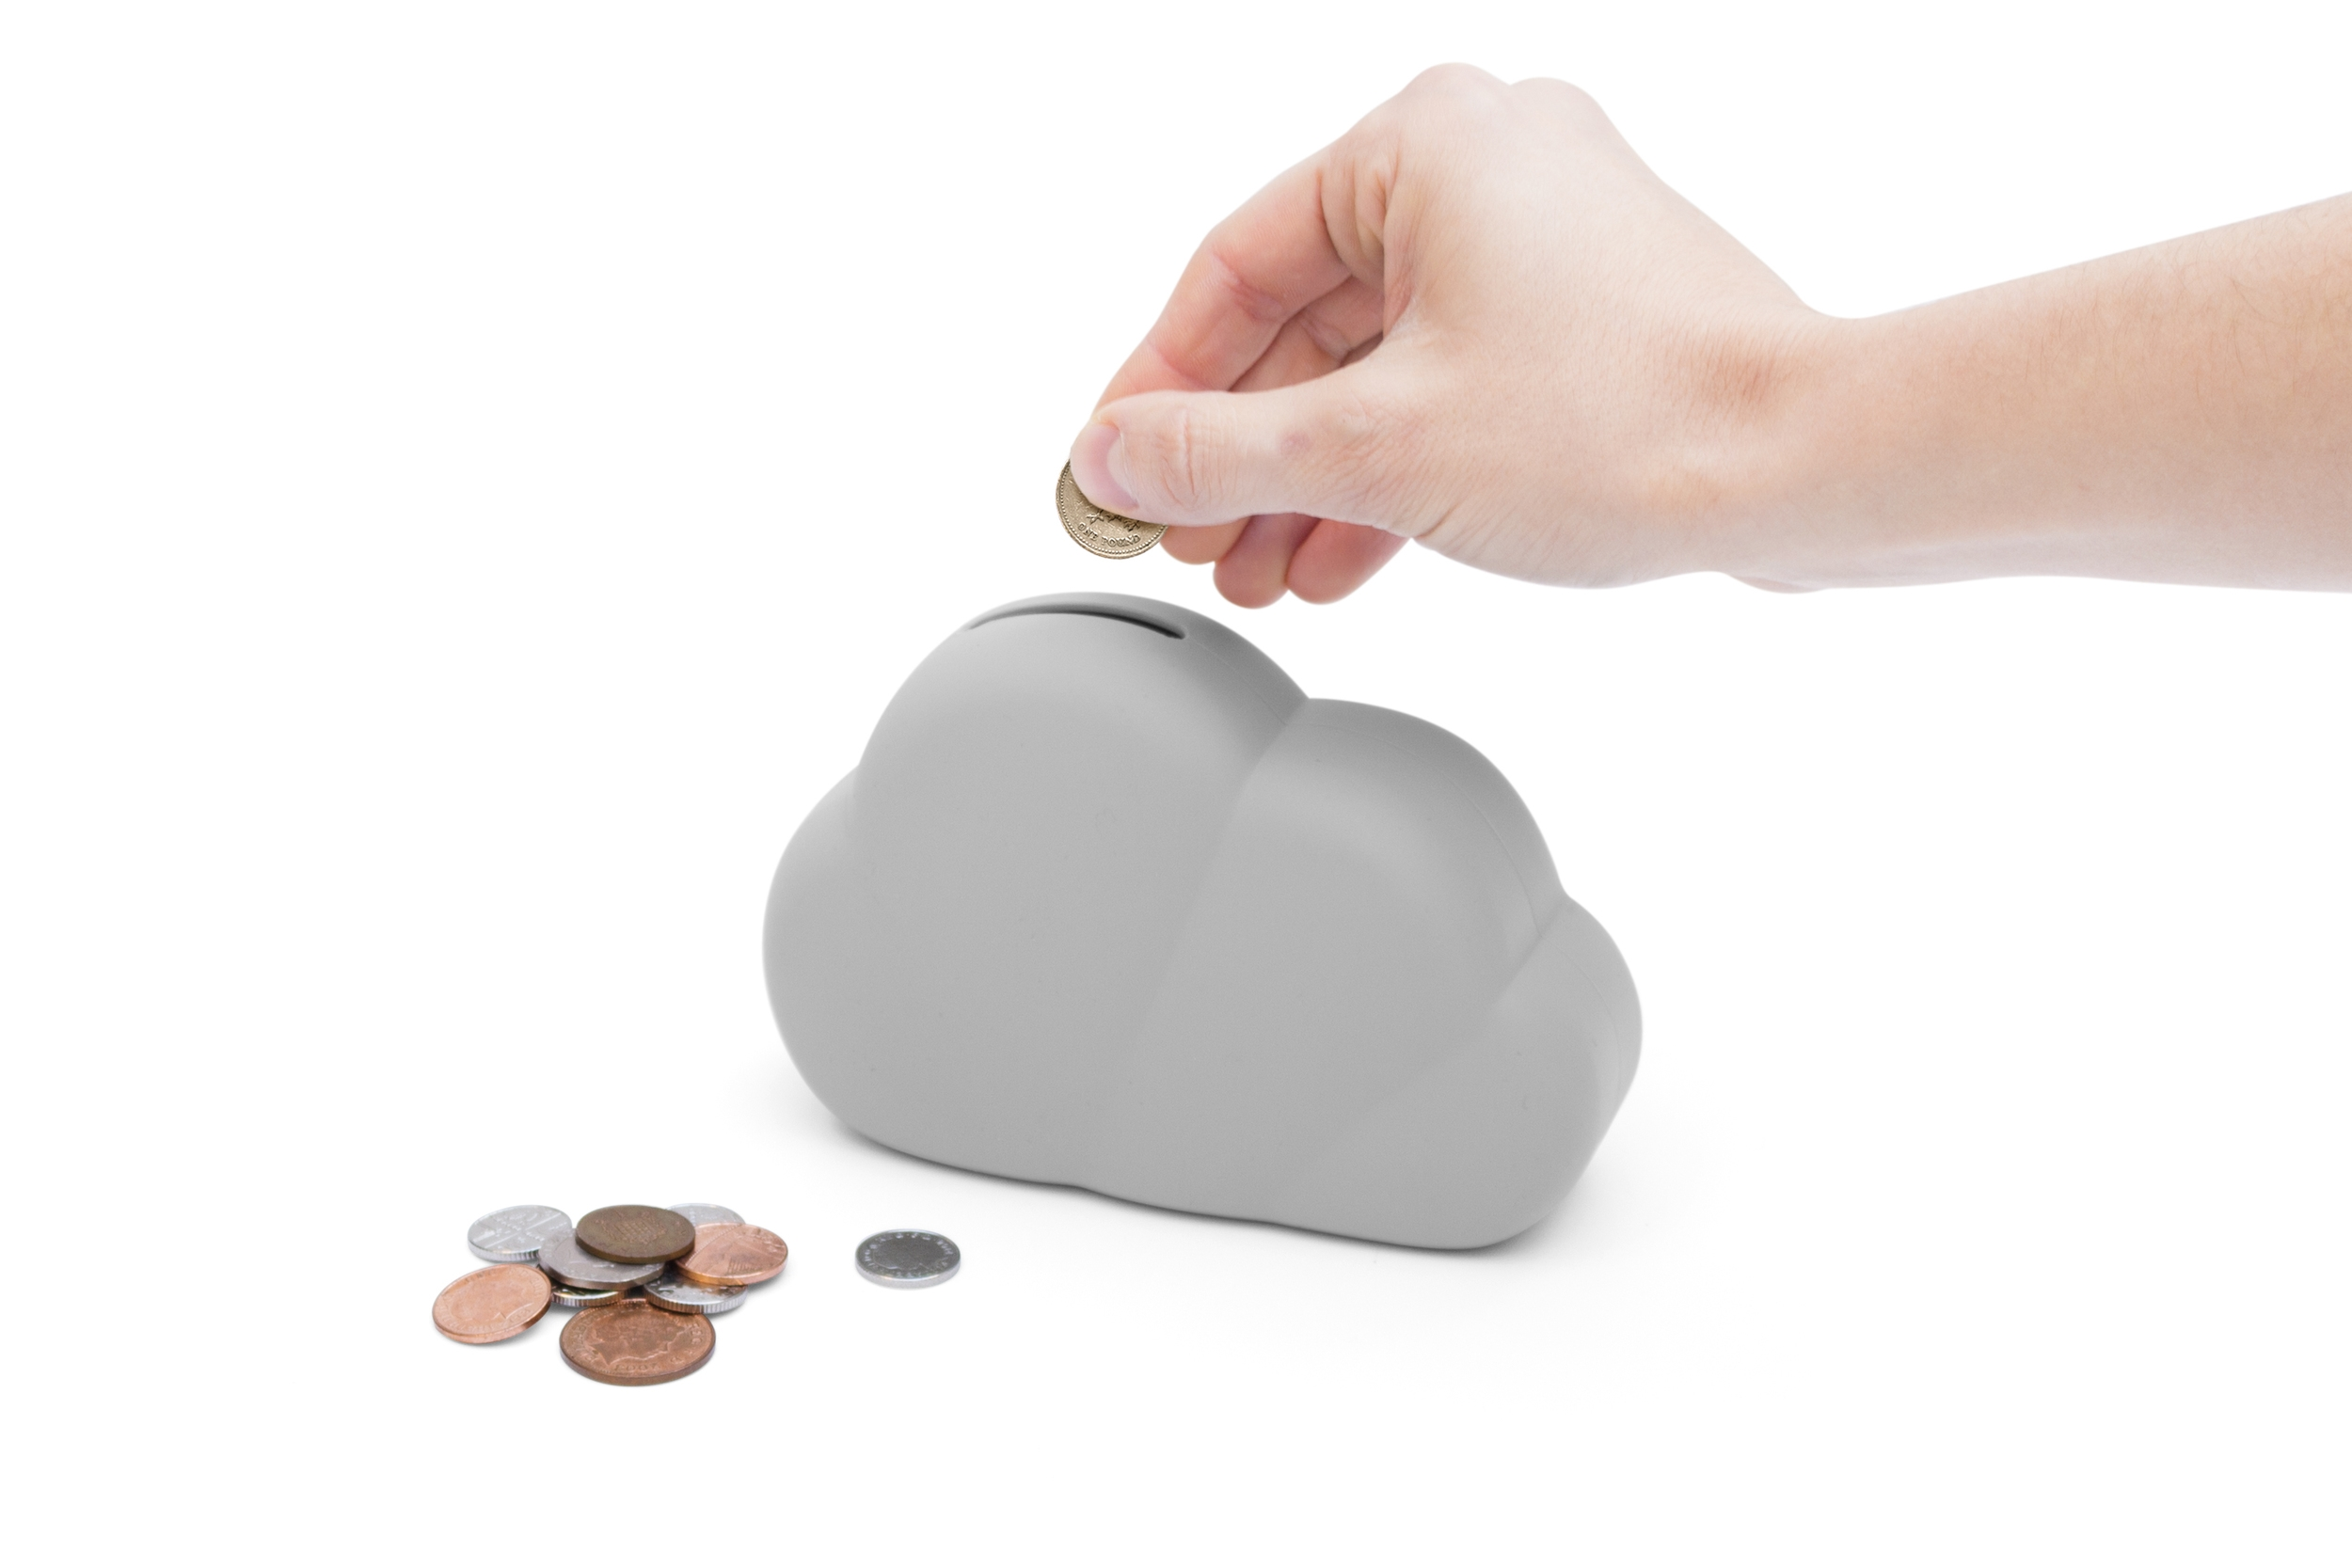 cloud_money_bank_hand